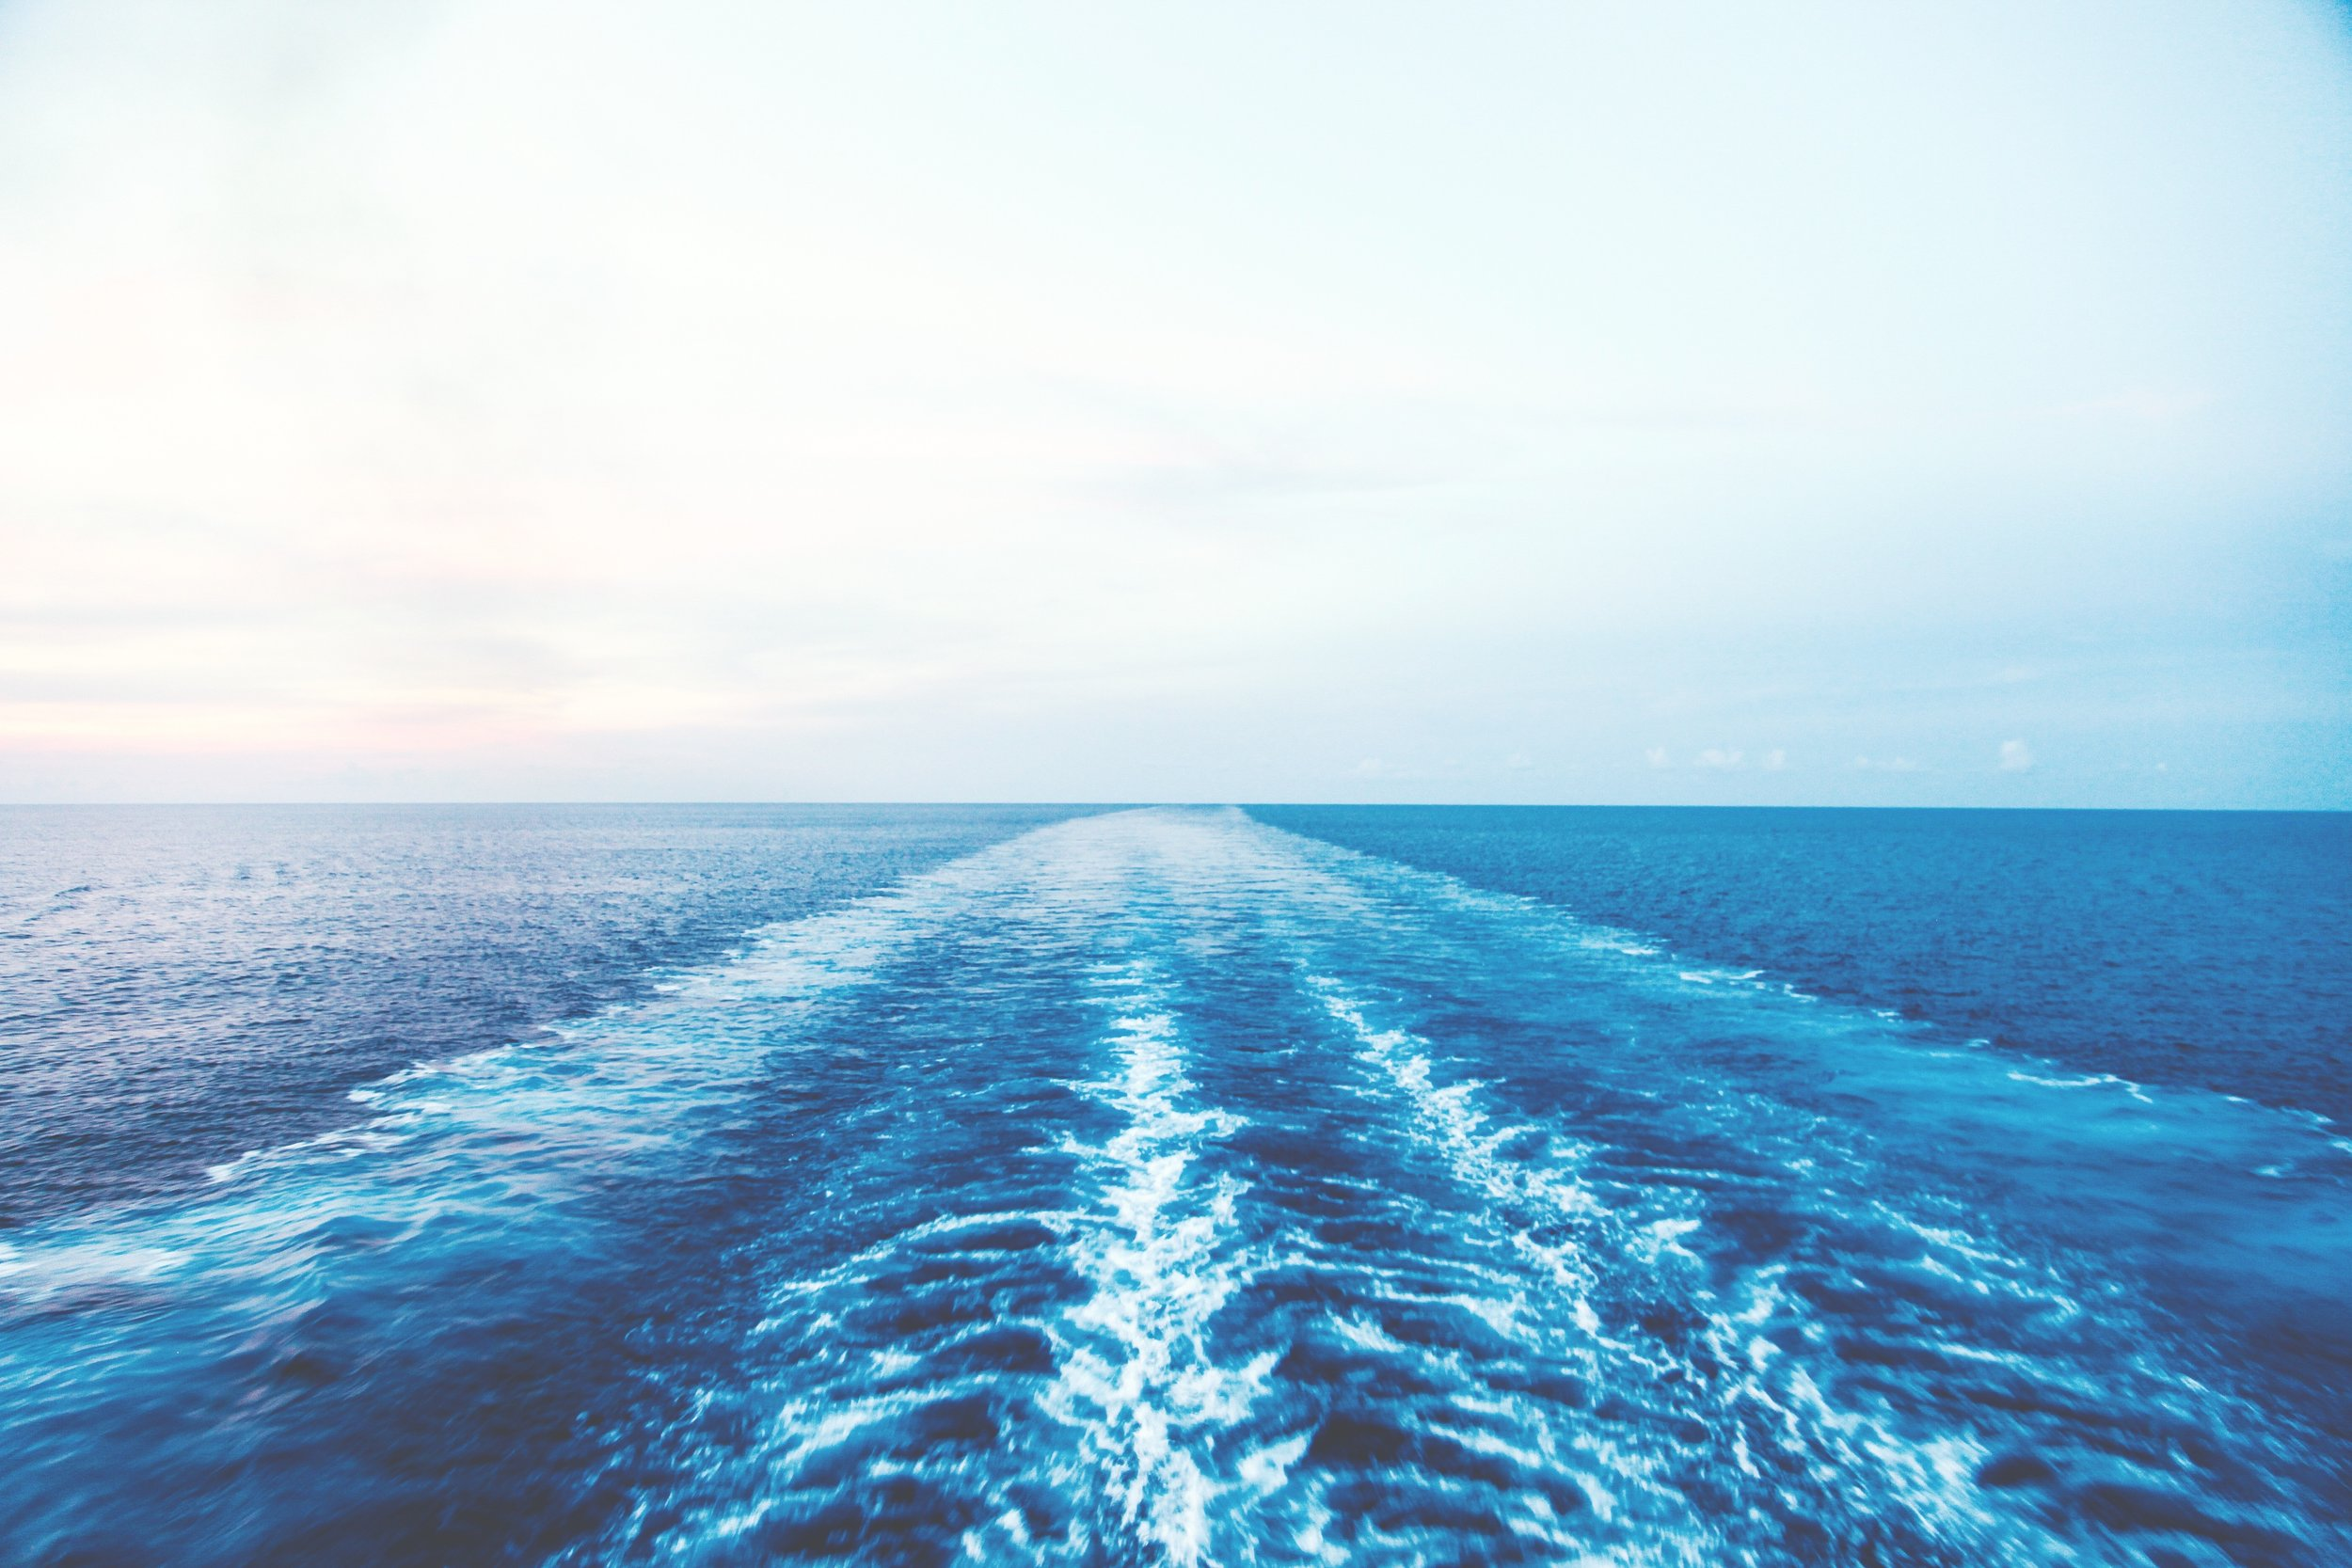 blue-nature-ocean-26681.jpg